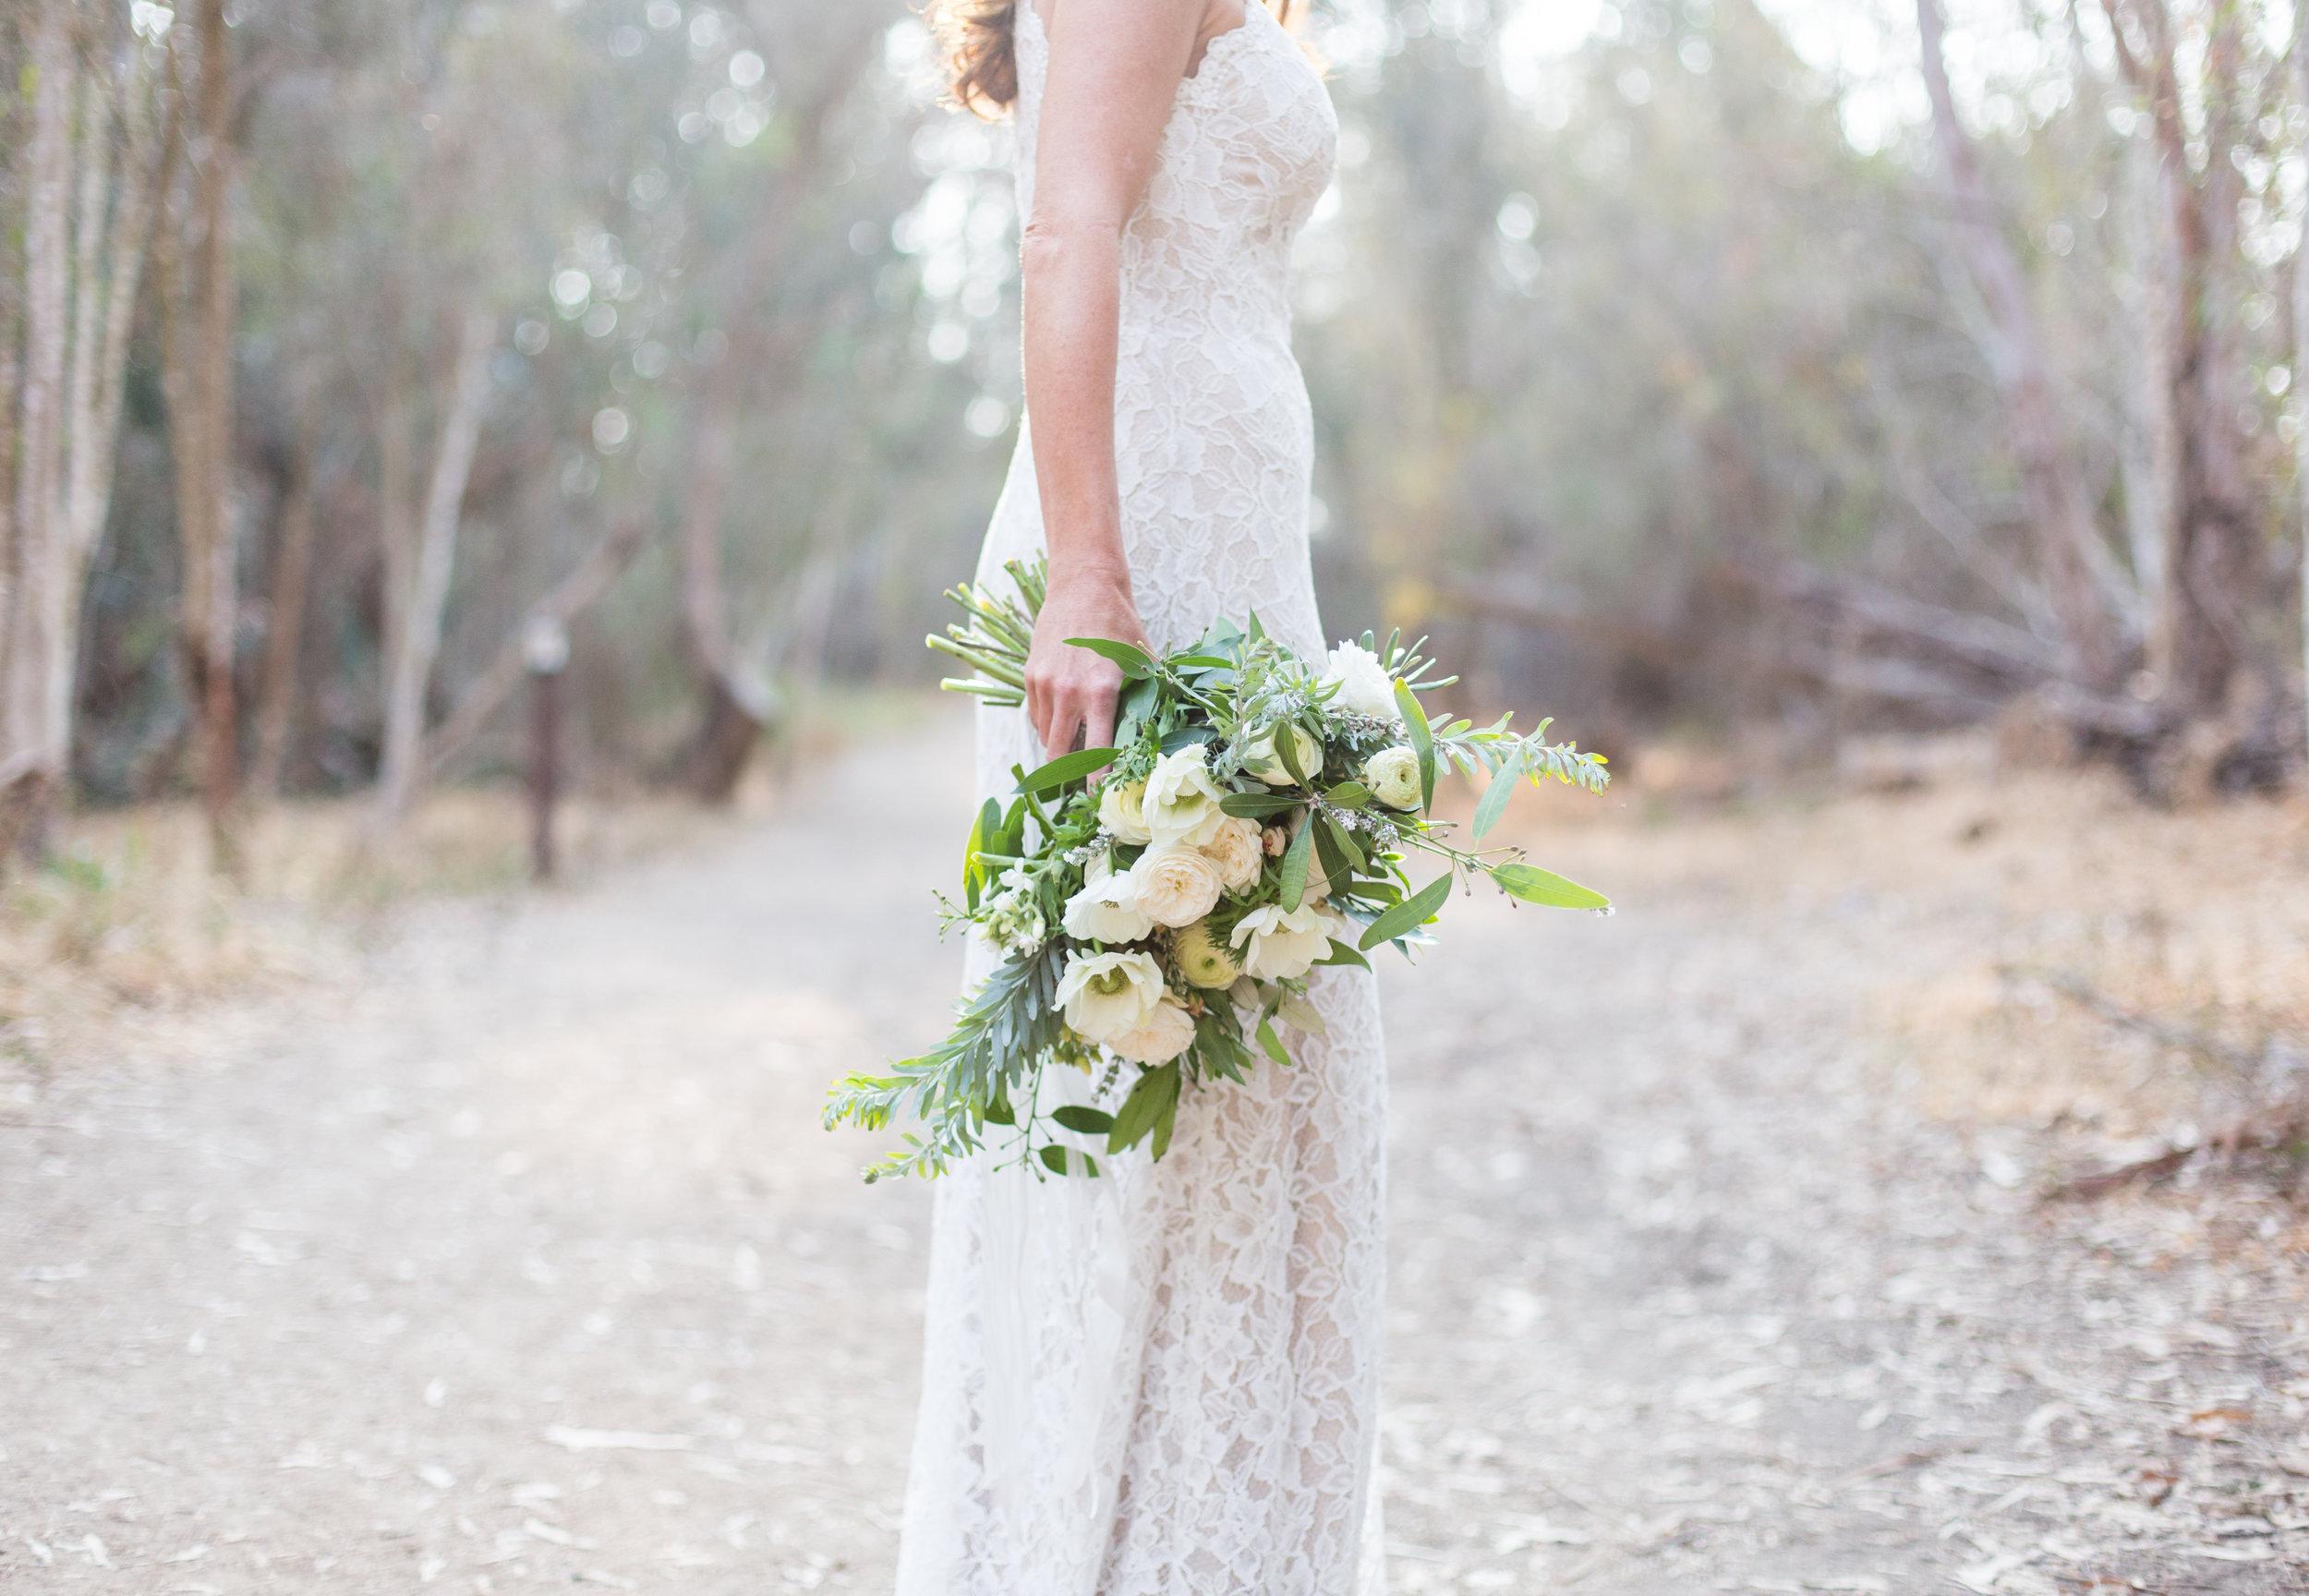 santa-barbara-elopement-elope-wedding-planner-coordinator-coordination-day-of-intimate-rustic-ellwood-bluffs-forest-beach-ocean-view-green-white-event (5).jpg